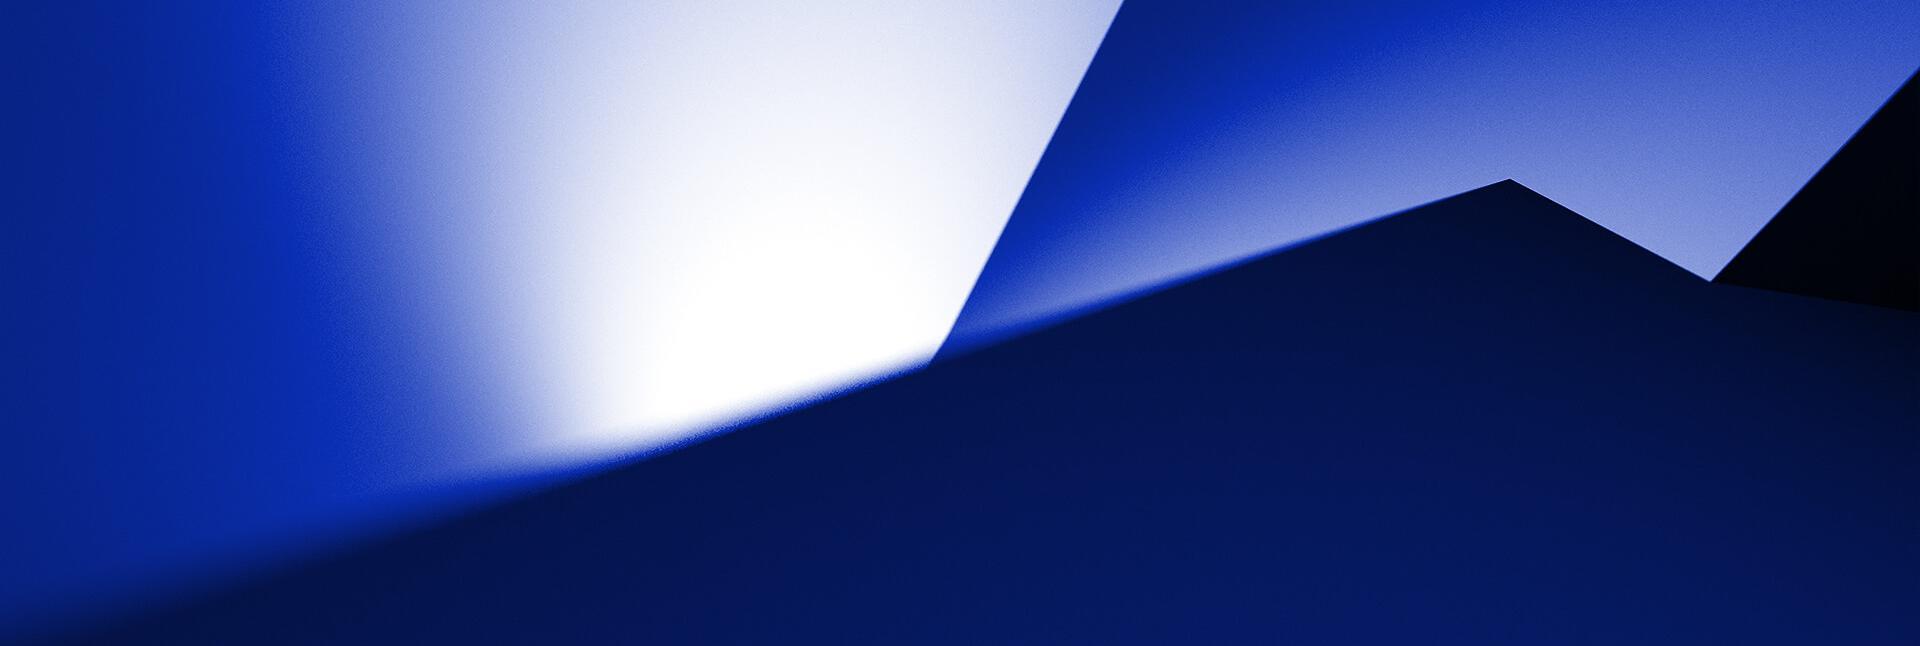 rra-background-blue-12-2021.jpg